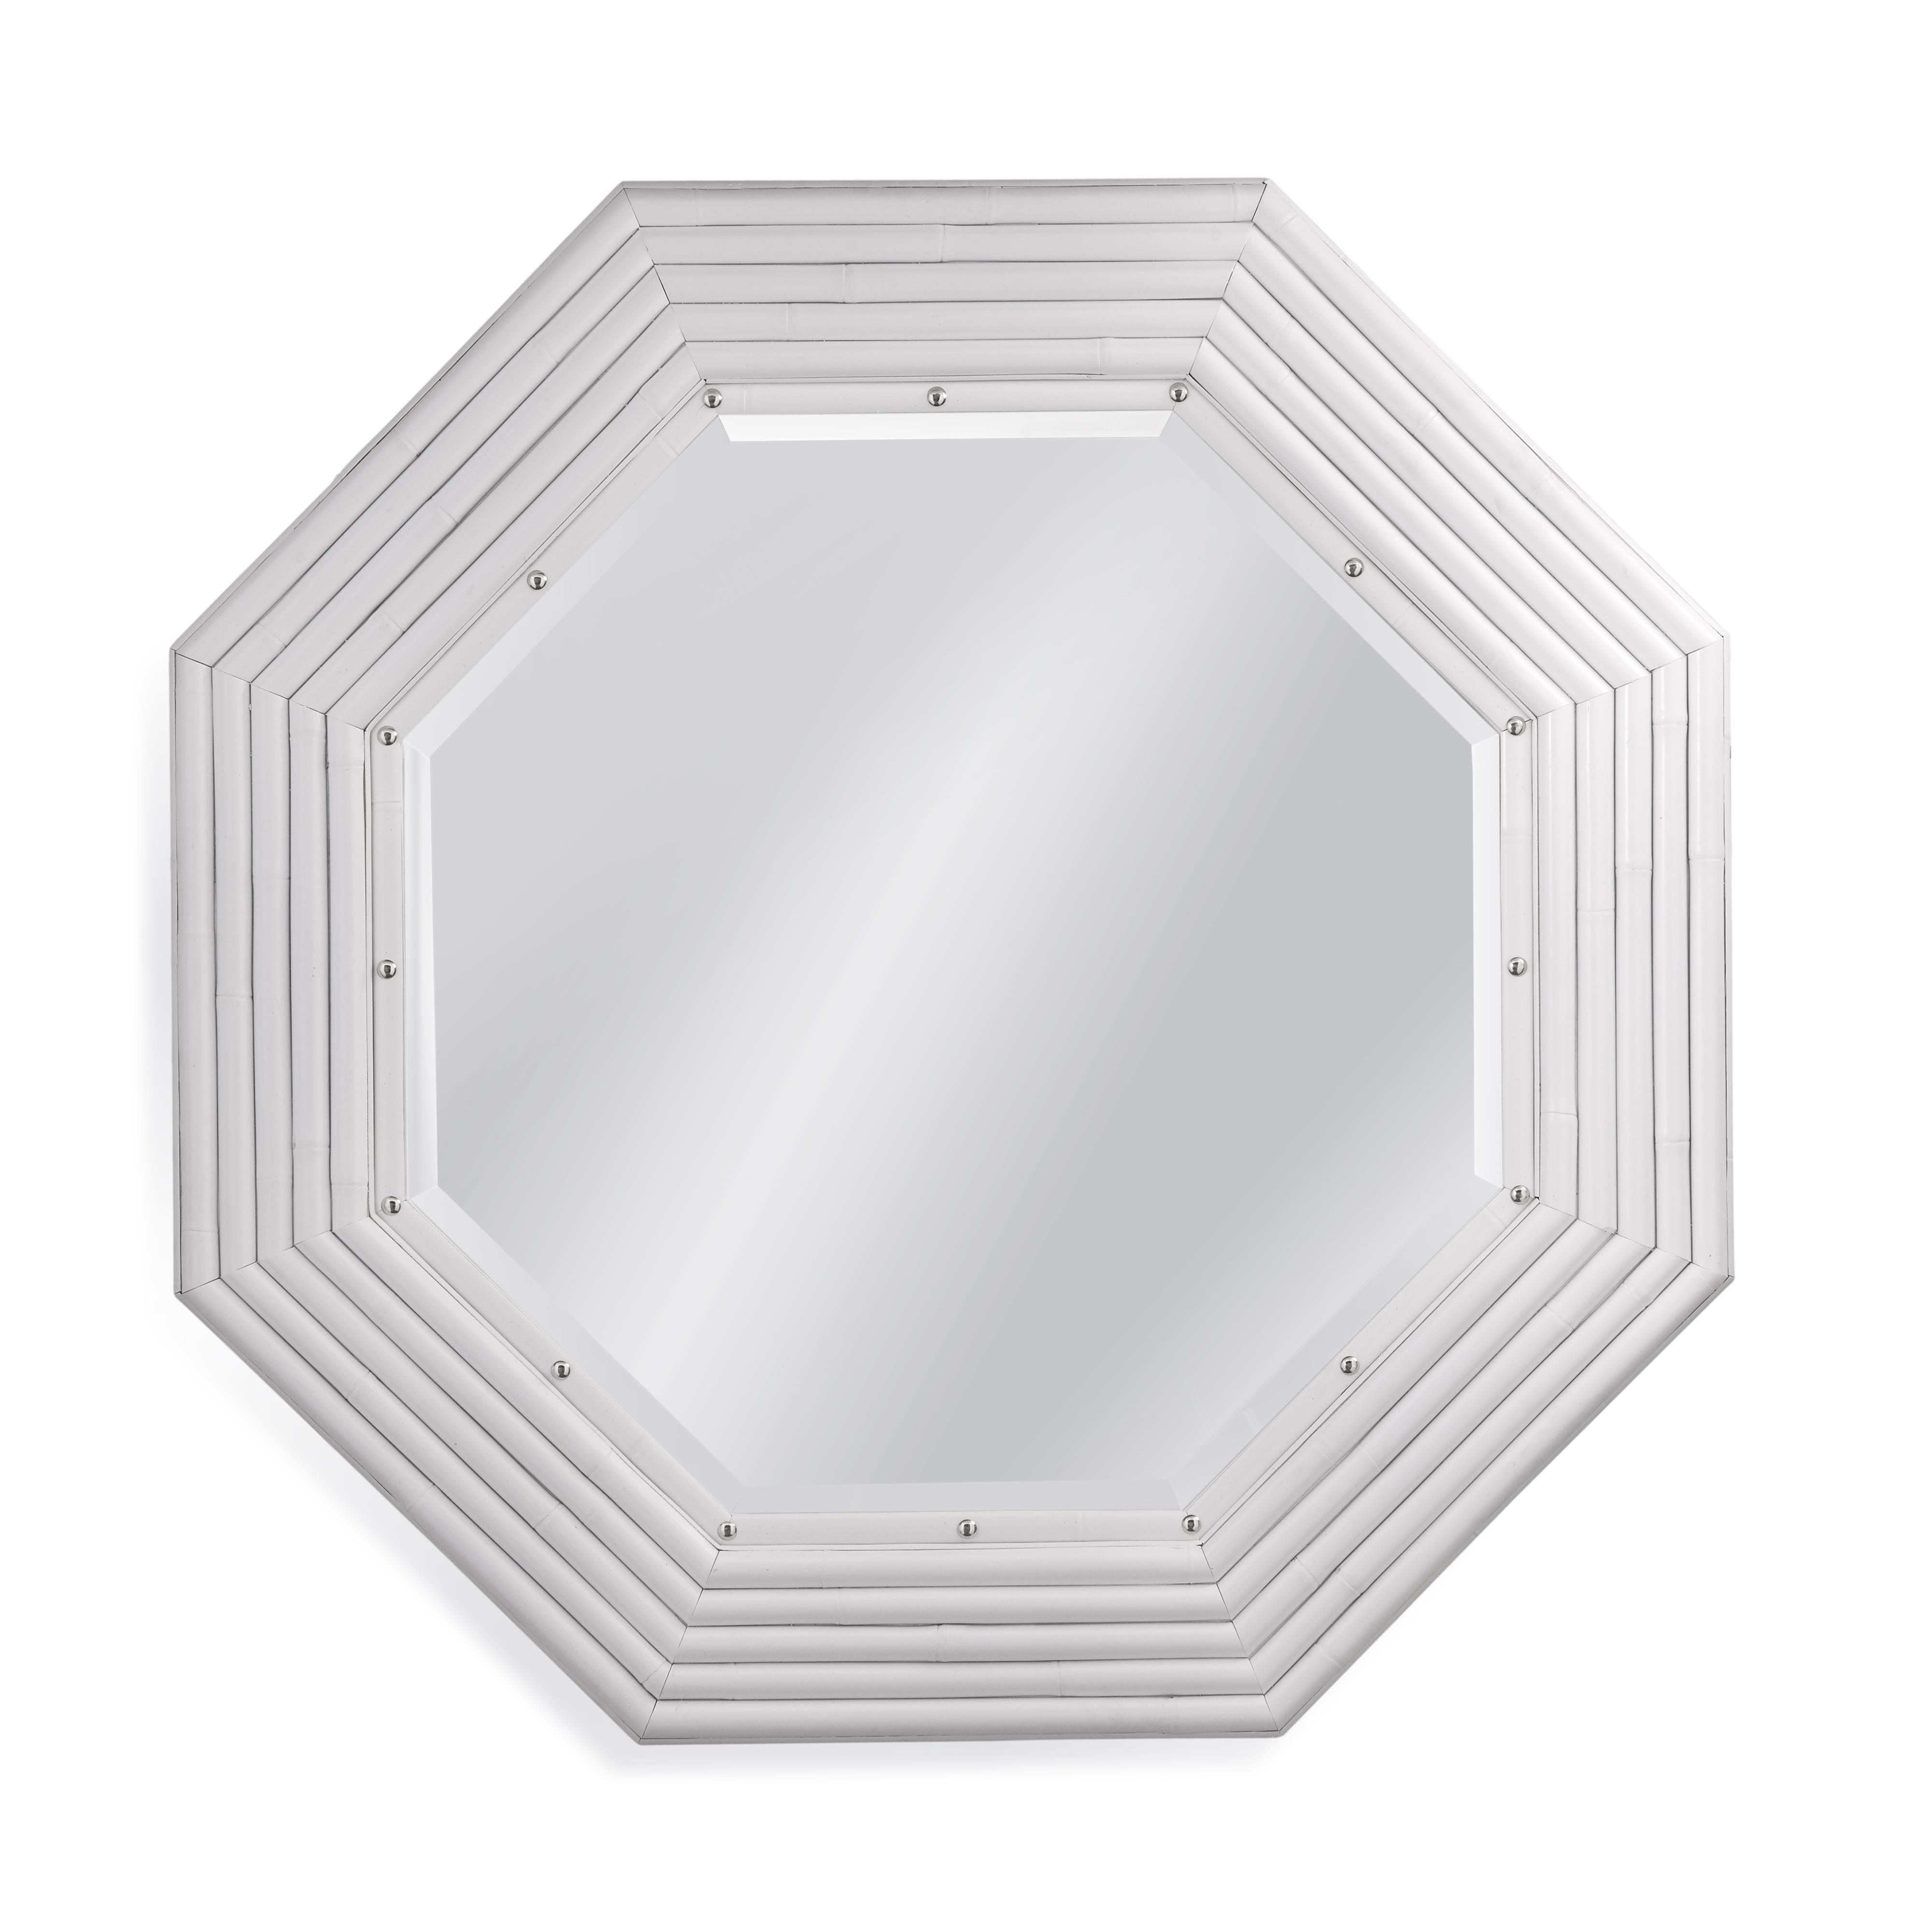 Pan Pacific Sanford Wall Mirror by Bassett Mirror at Alison Craig Home Furnishings